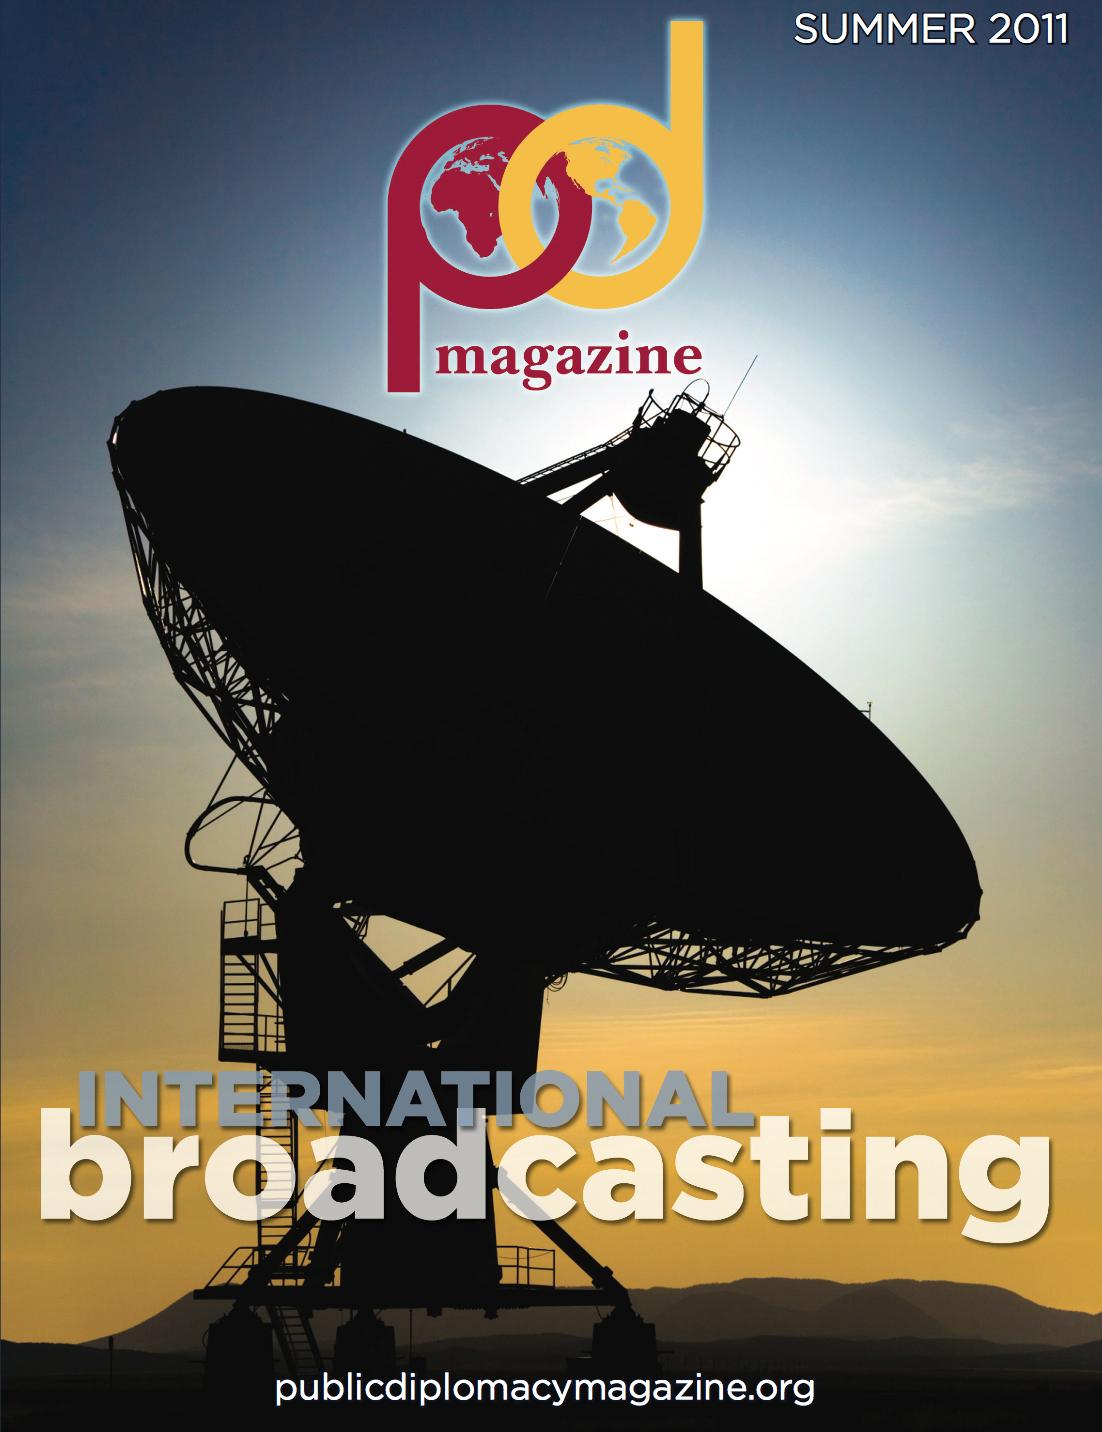 International Broadcasting